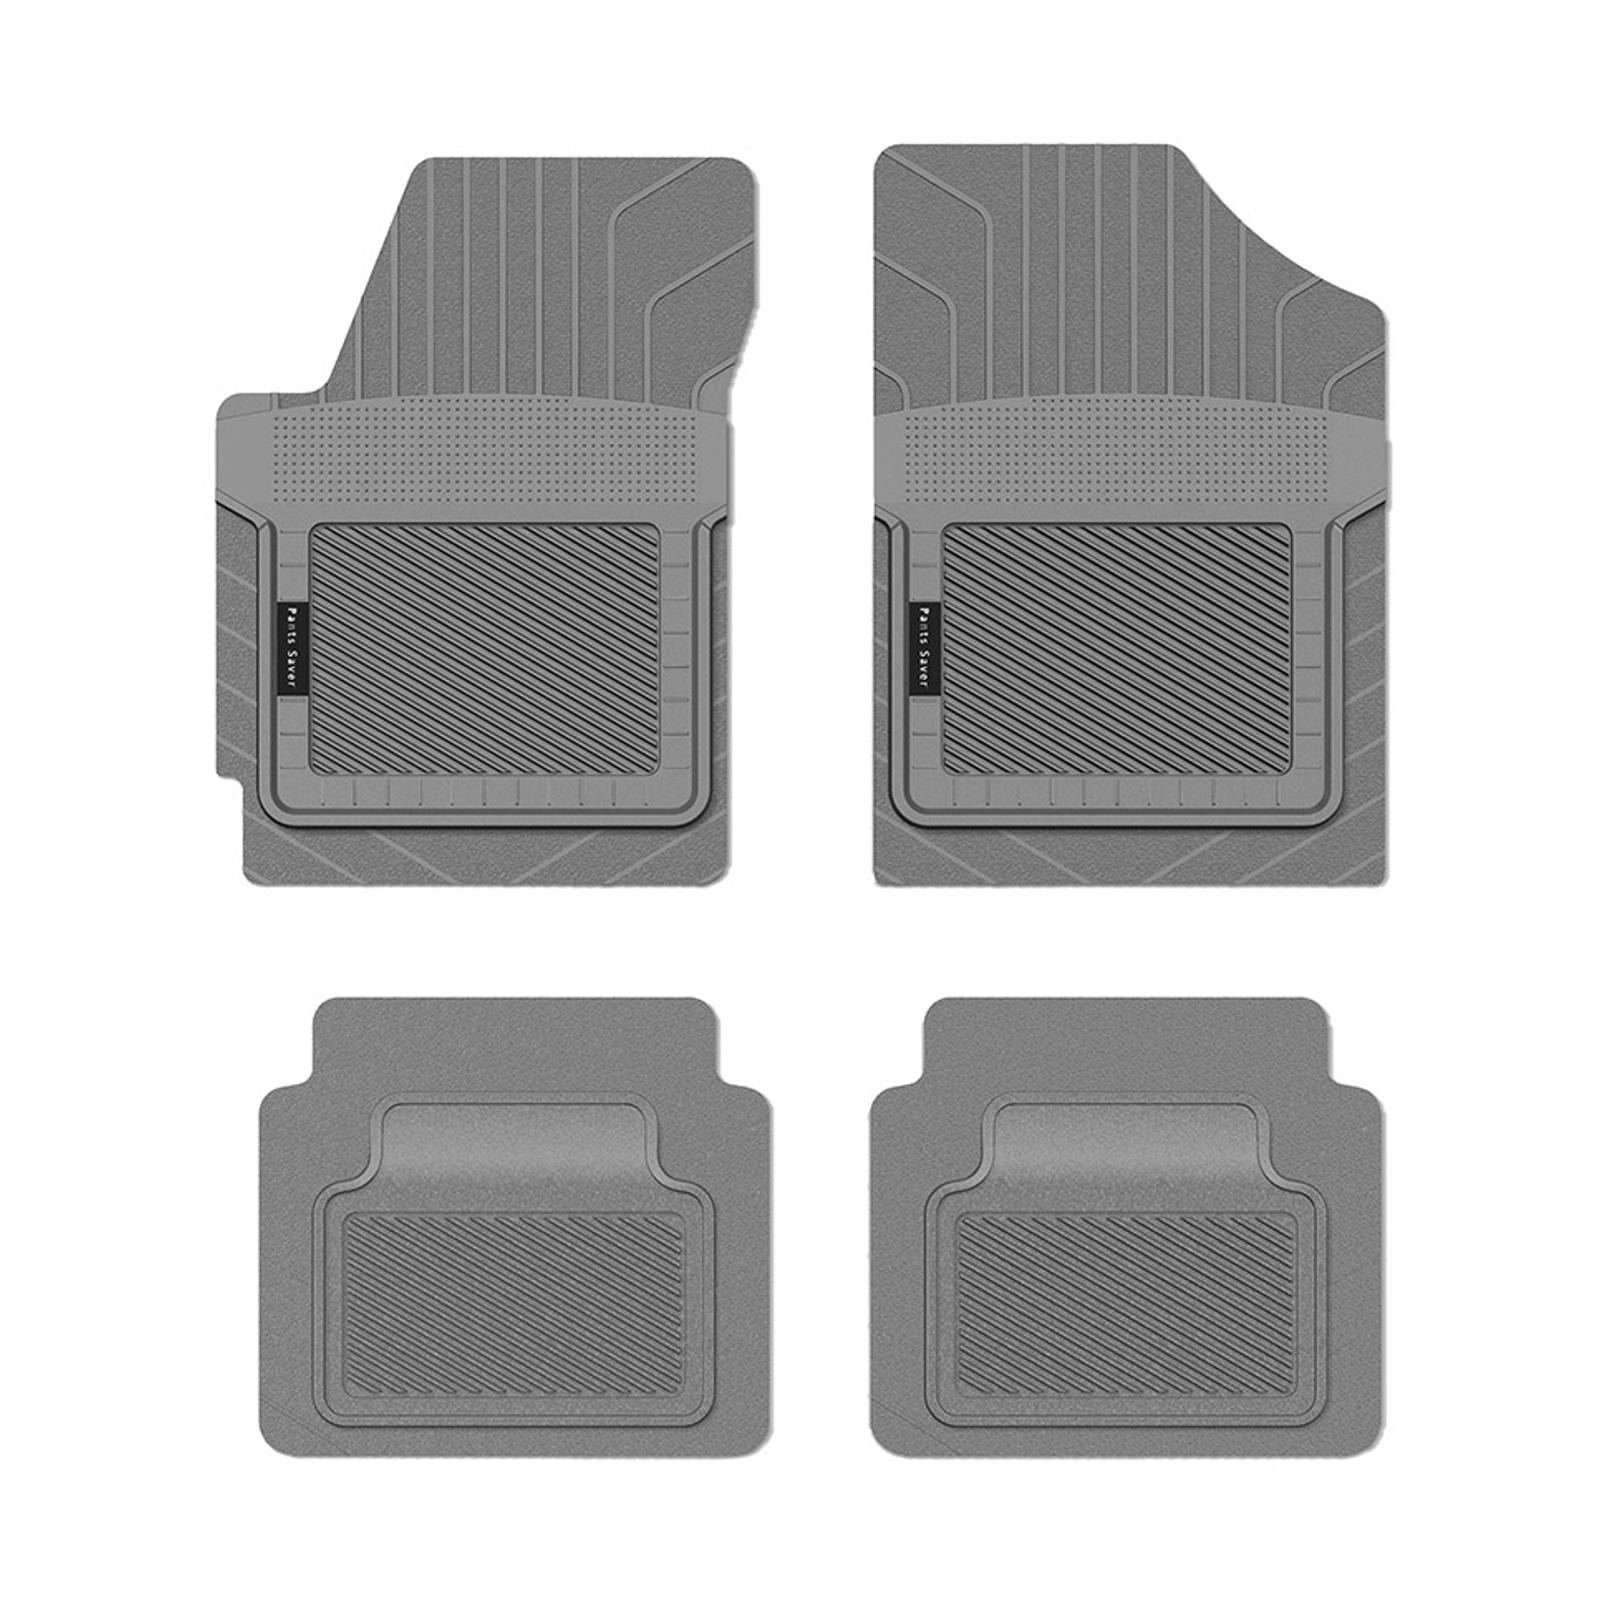 Koolatron Pants Saver Custom Fit Car Mat 4PC VOLKSWAGEN GOLF R 2005 Tan PartNumber: 02837346000P KsnValue: 082V009219862000 MfgPartNumber: 4305053